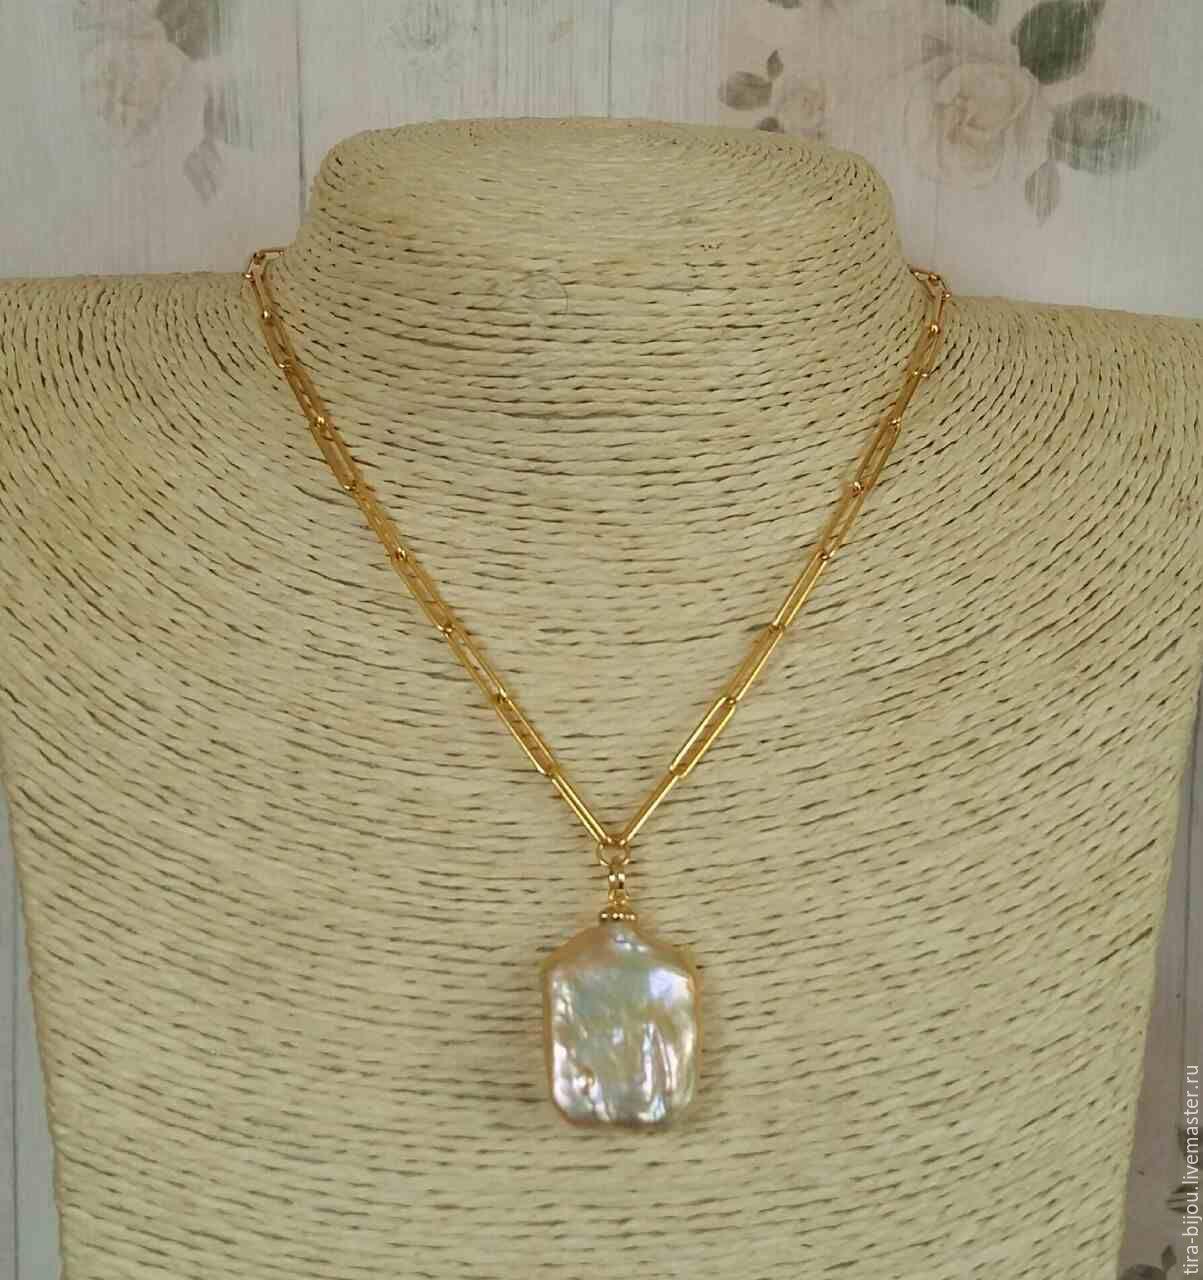 Chain with pendant Baroque pearls, serebro925, 14Karat, Pendants, Moscow,  Фото №1